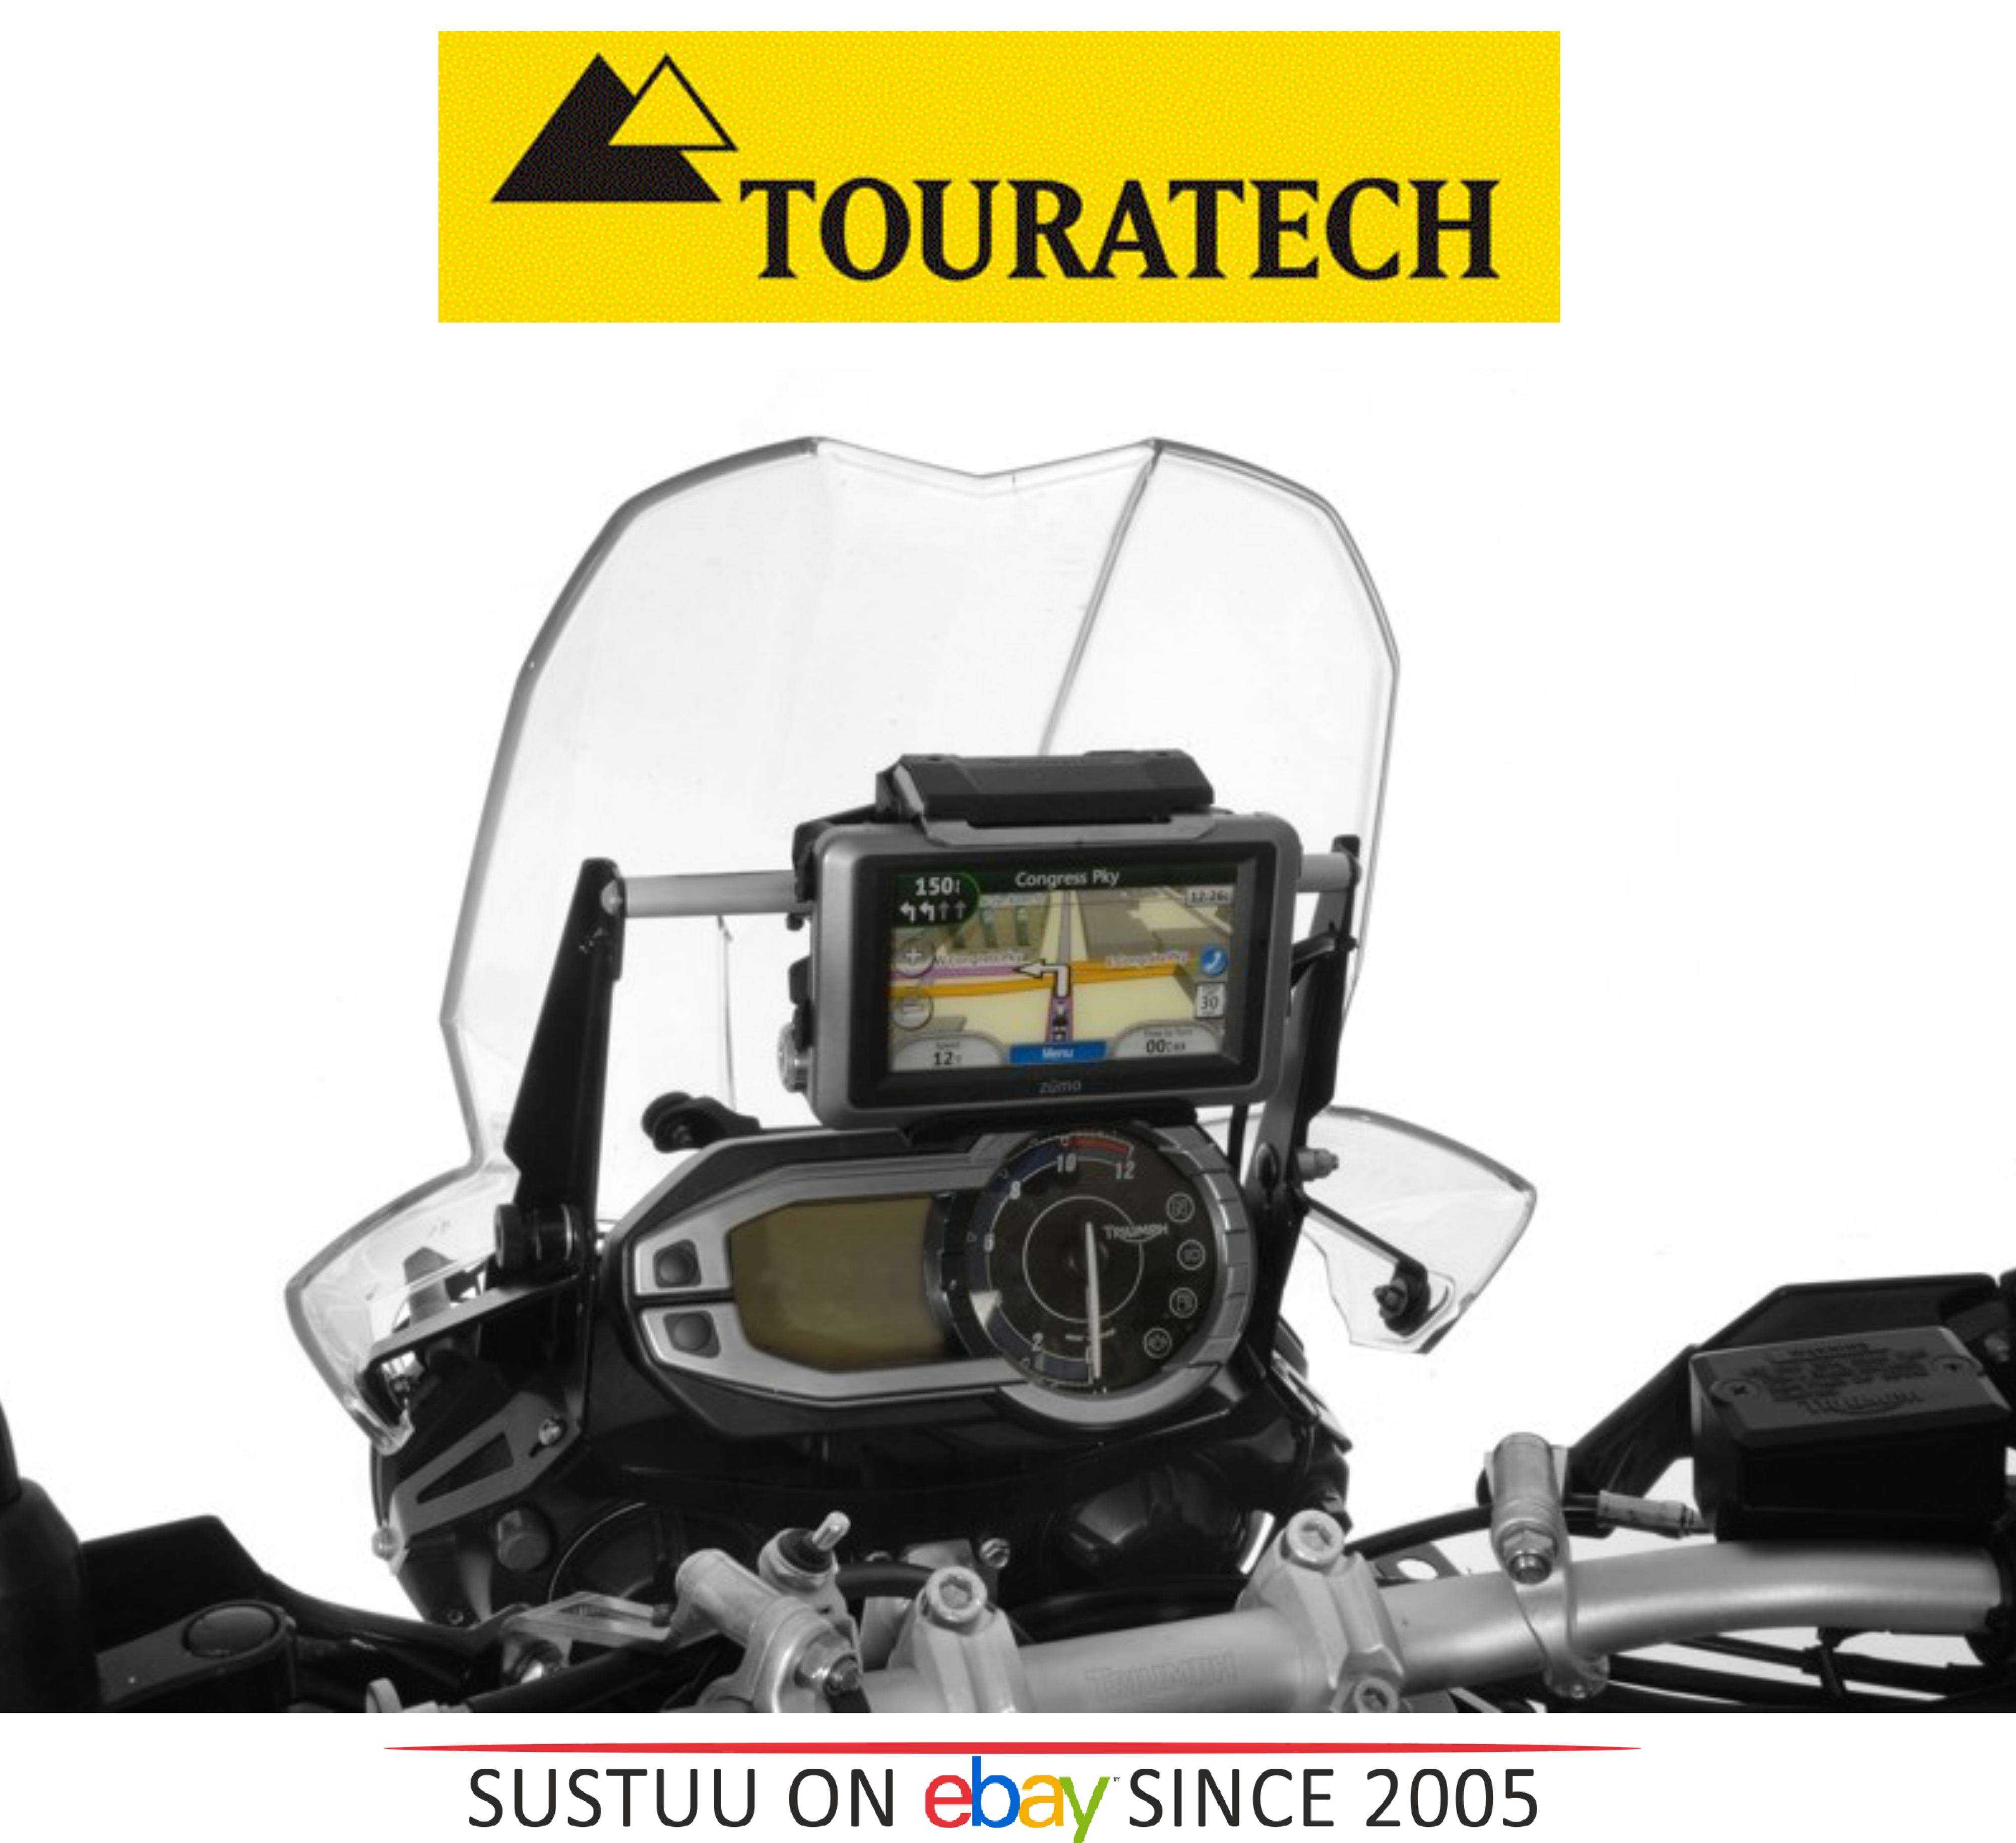 Touratech Adaptor Triumph Tiger 800xc Gps Winwindscreen Adjuster